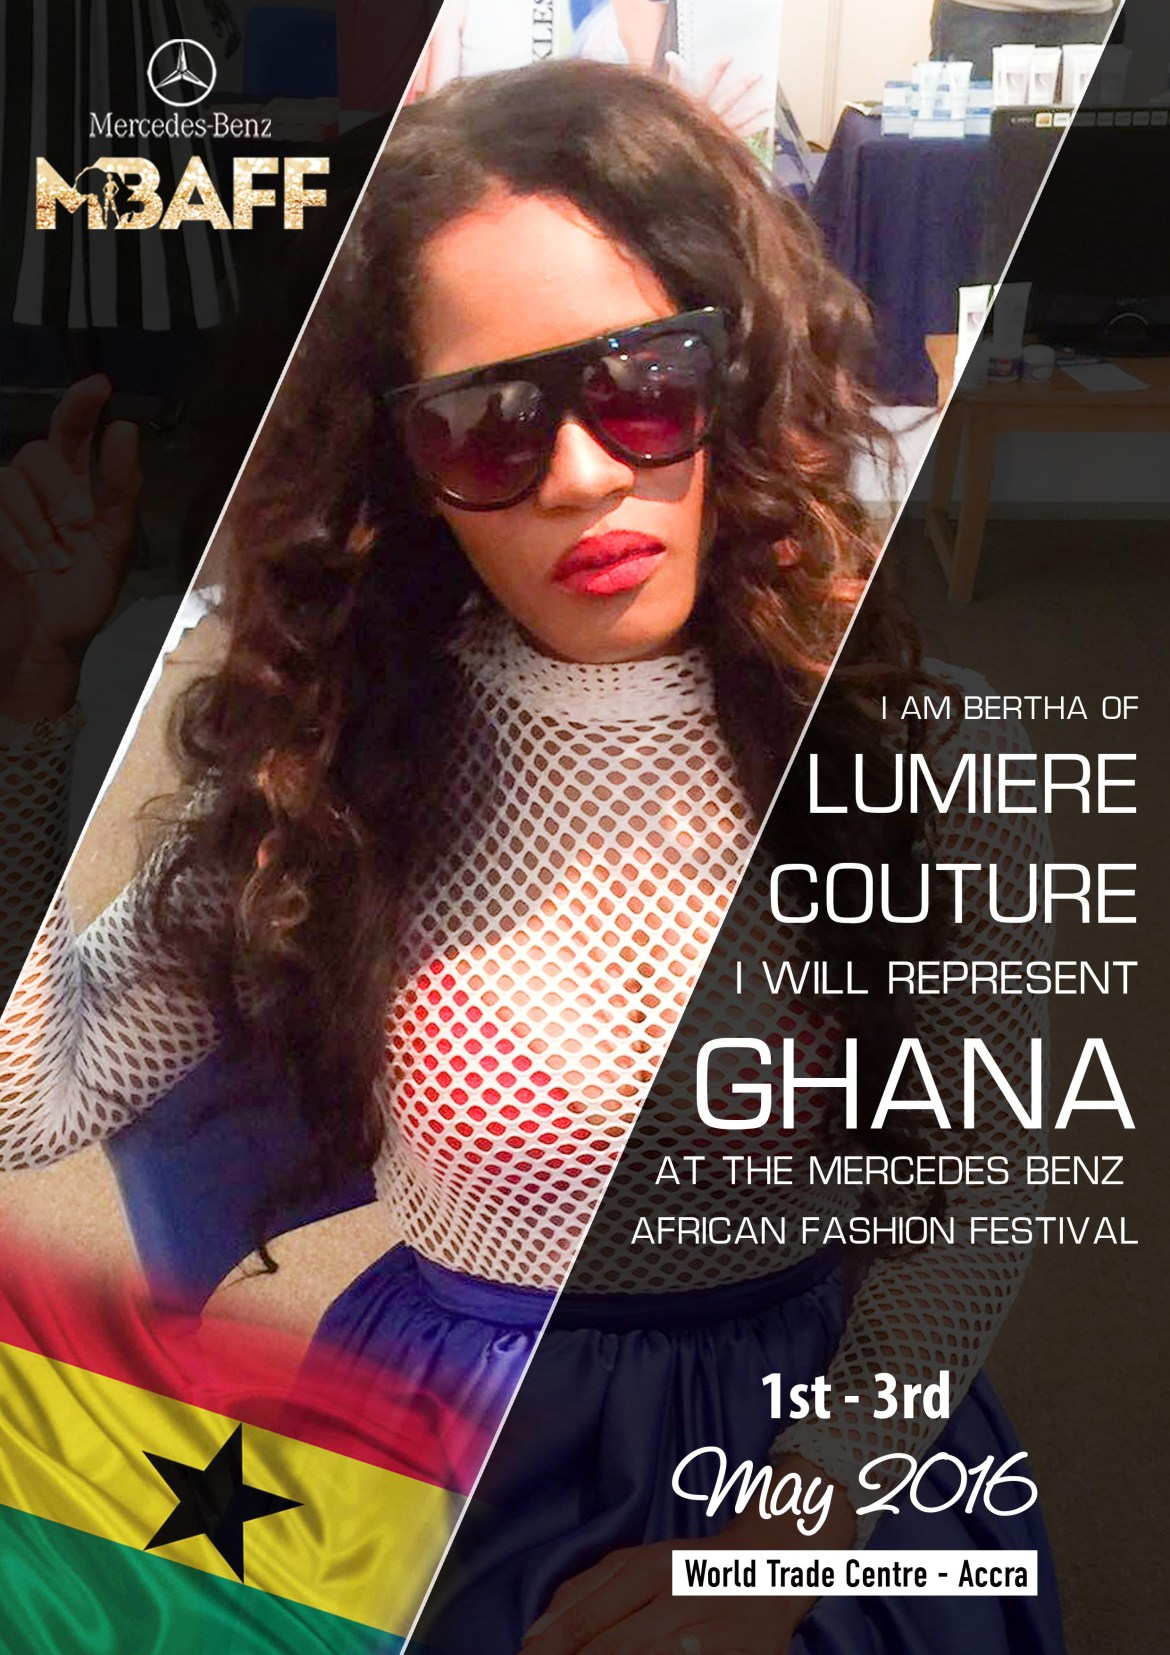 mercedez benz african fashion festival (12)